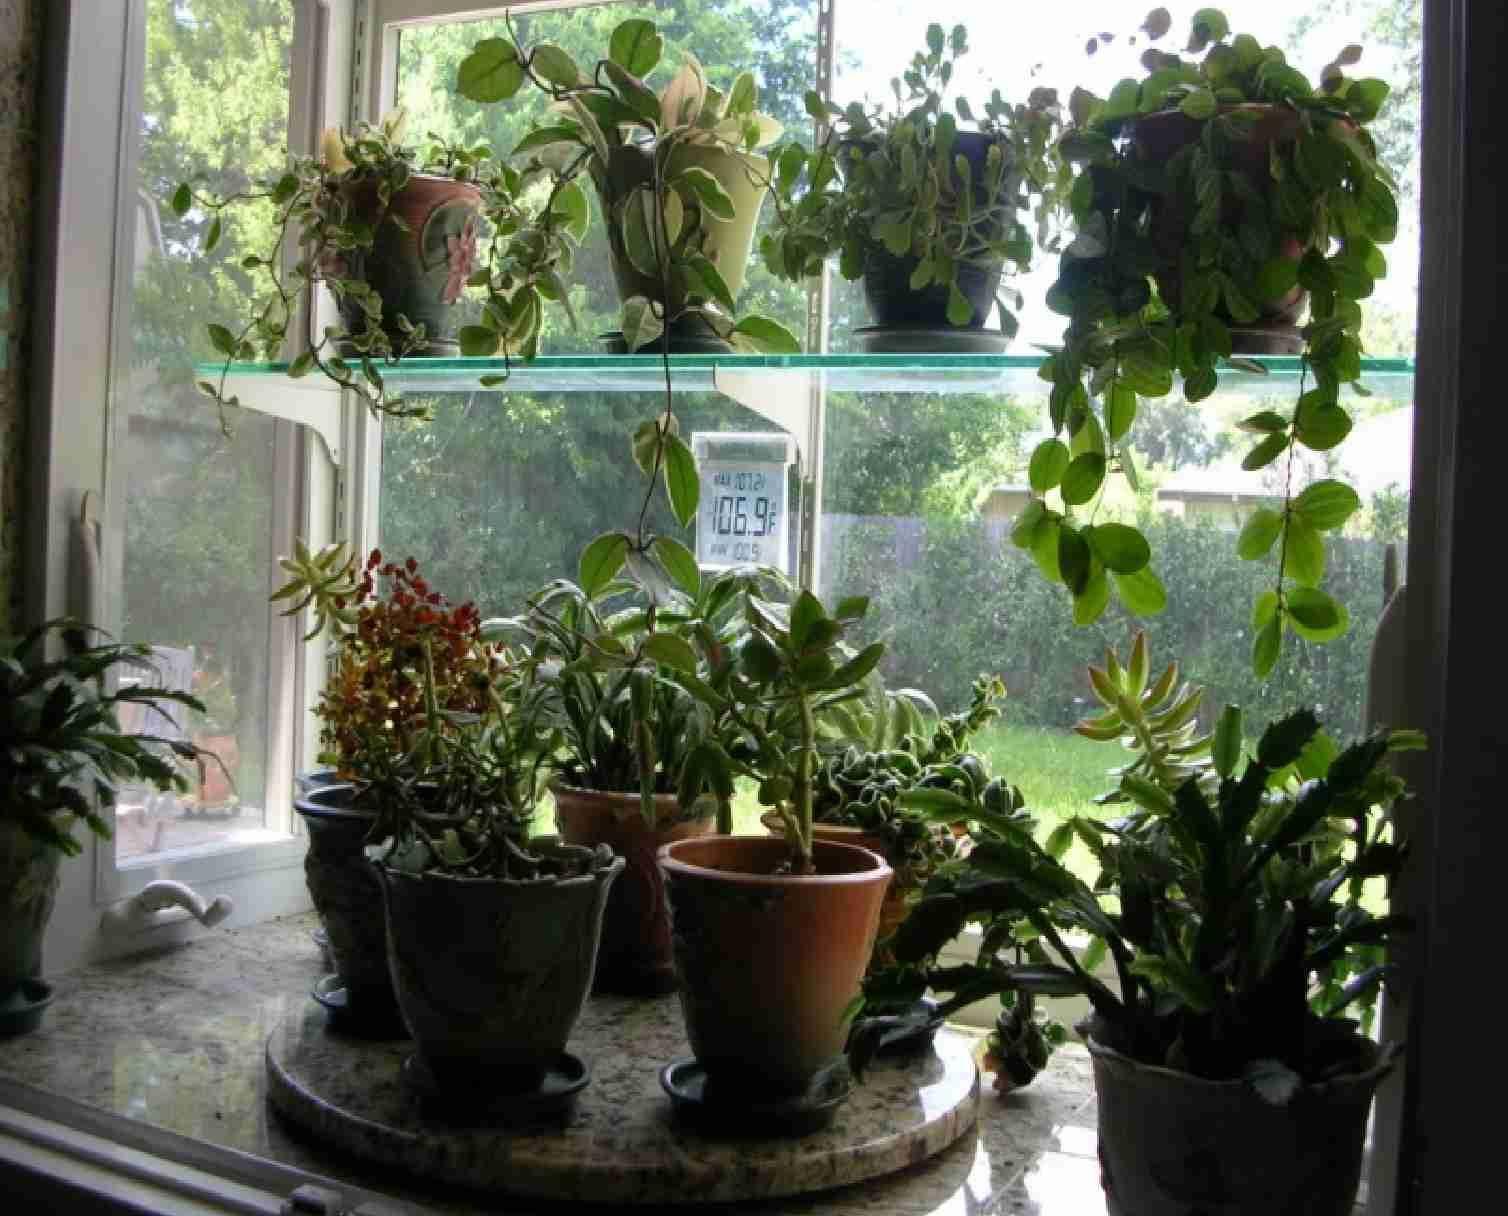 Garden Kitchen Window. Plus Lazy Susan is an excellent idea for ...